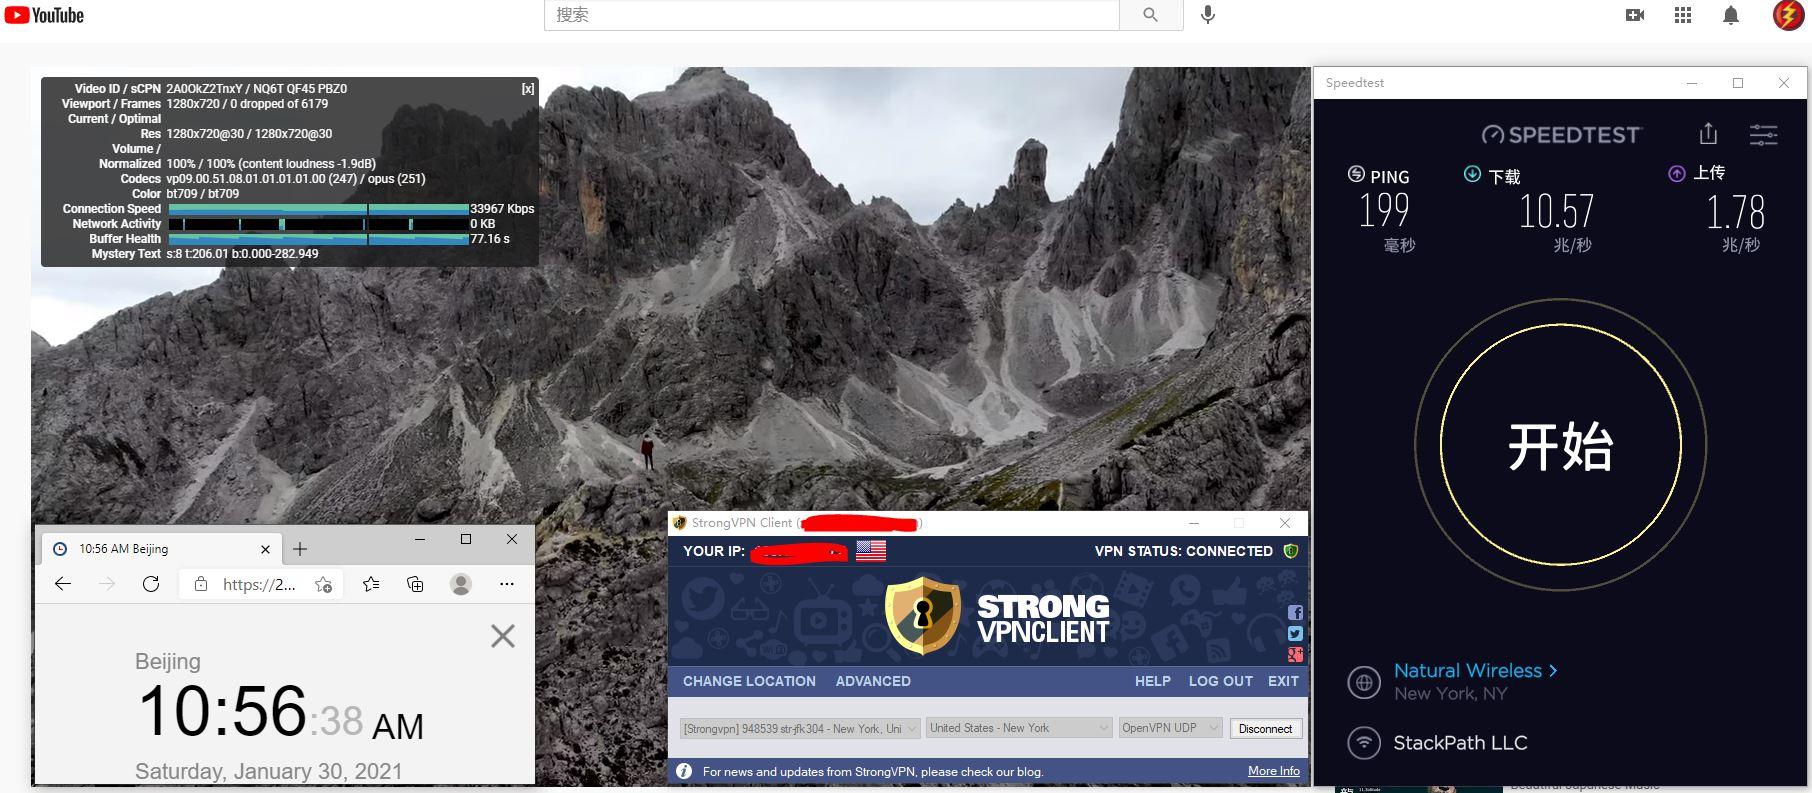 Windows10 StrongVPN 默认协议 USA - New York 服务器 中国VPN 翻墙 科学上网 10BEASTS Barry测试 - 20210130